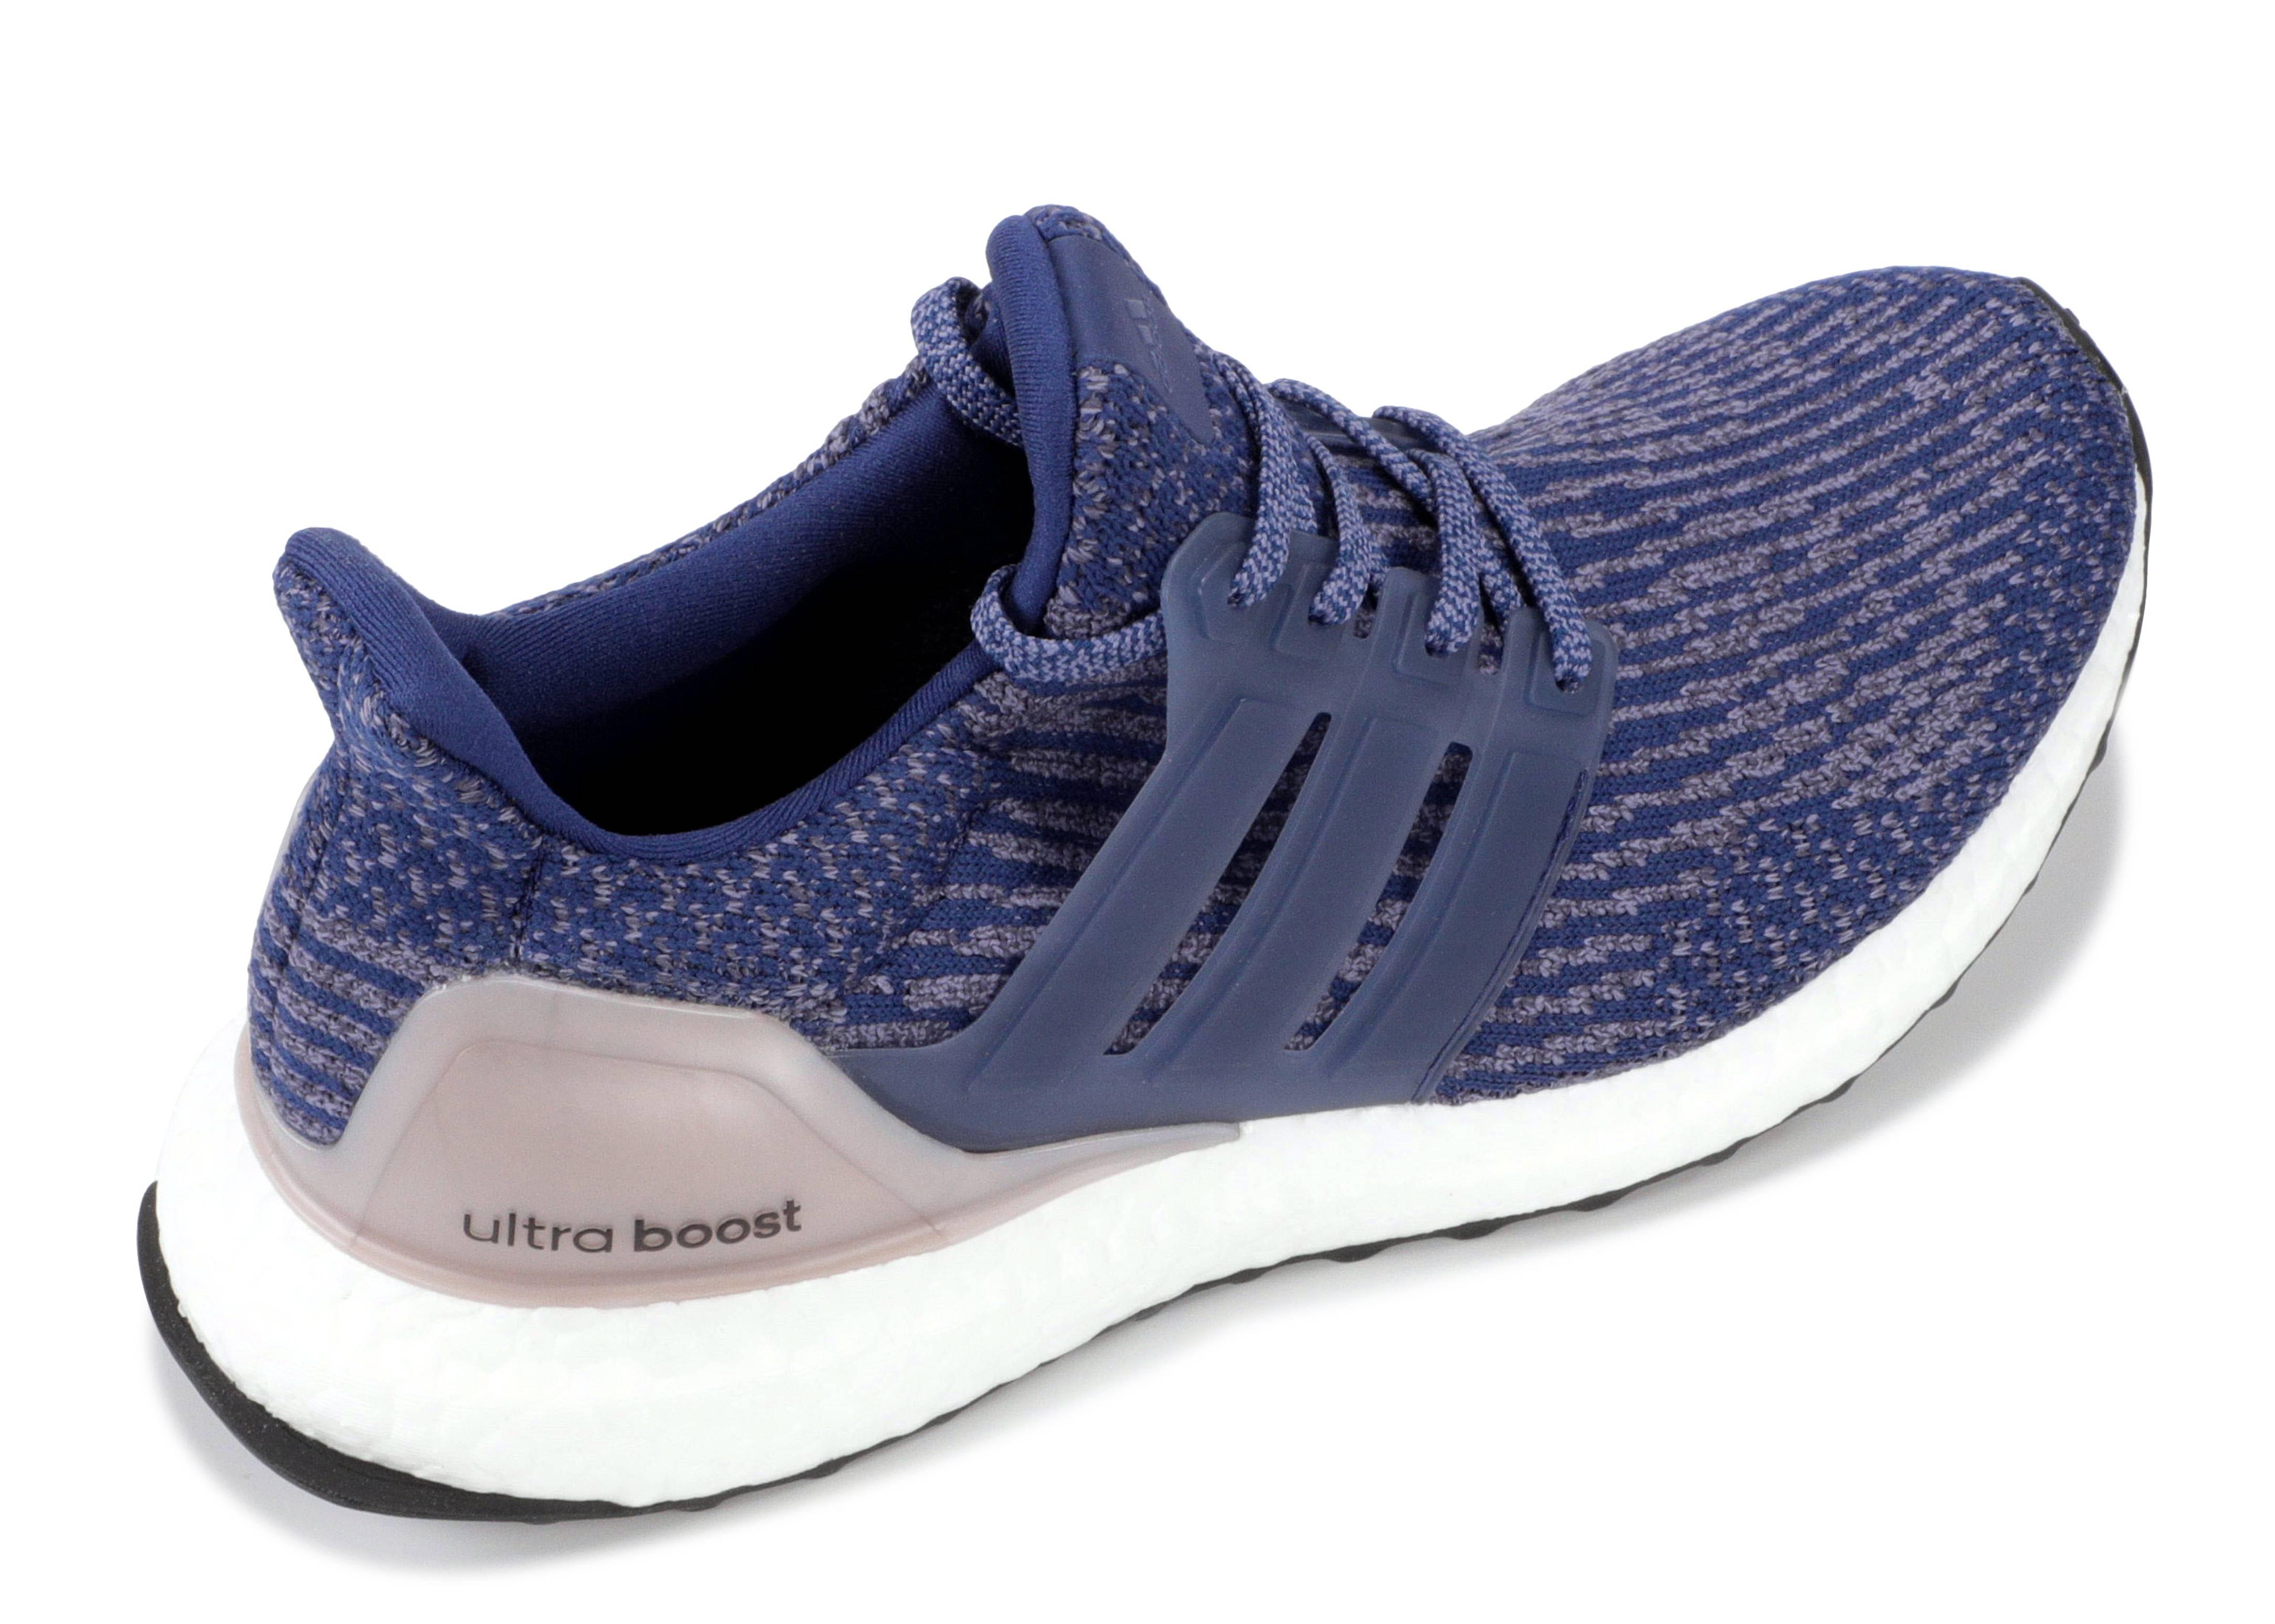 f0e5ffa7e3121 UltraBOOST W - Adidas - ba8928 - mystery blue mystery blue-vapour grey